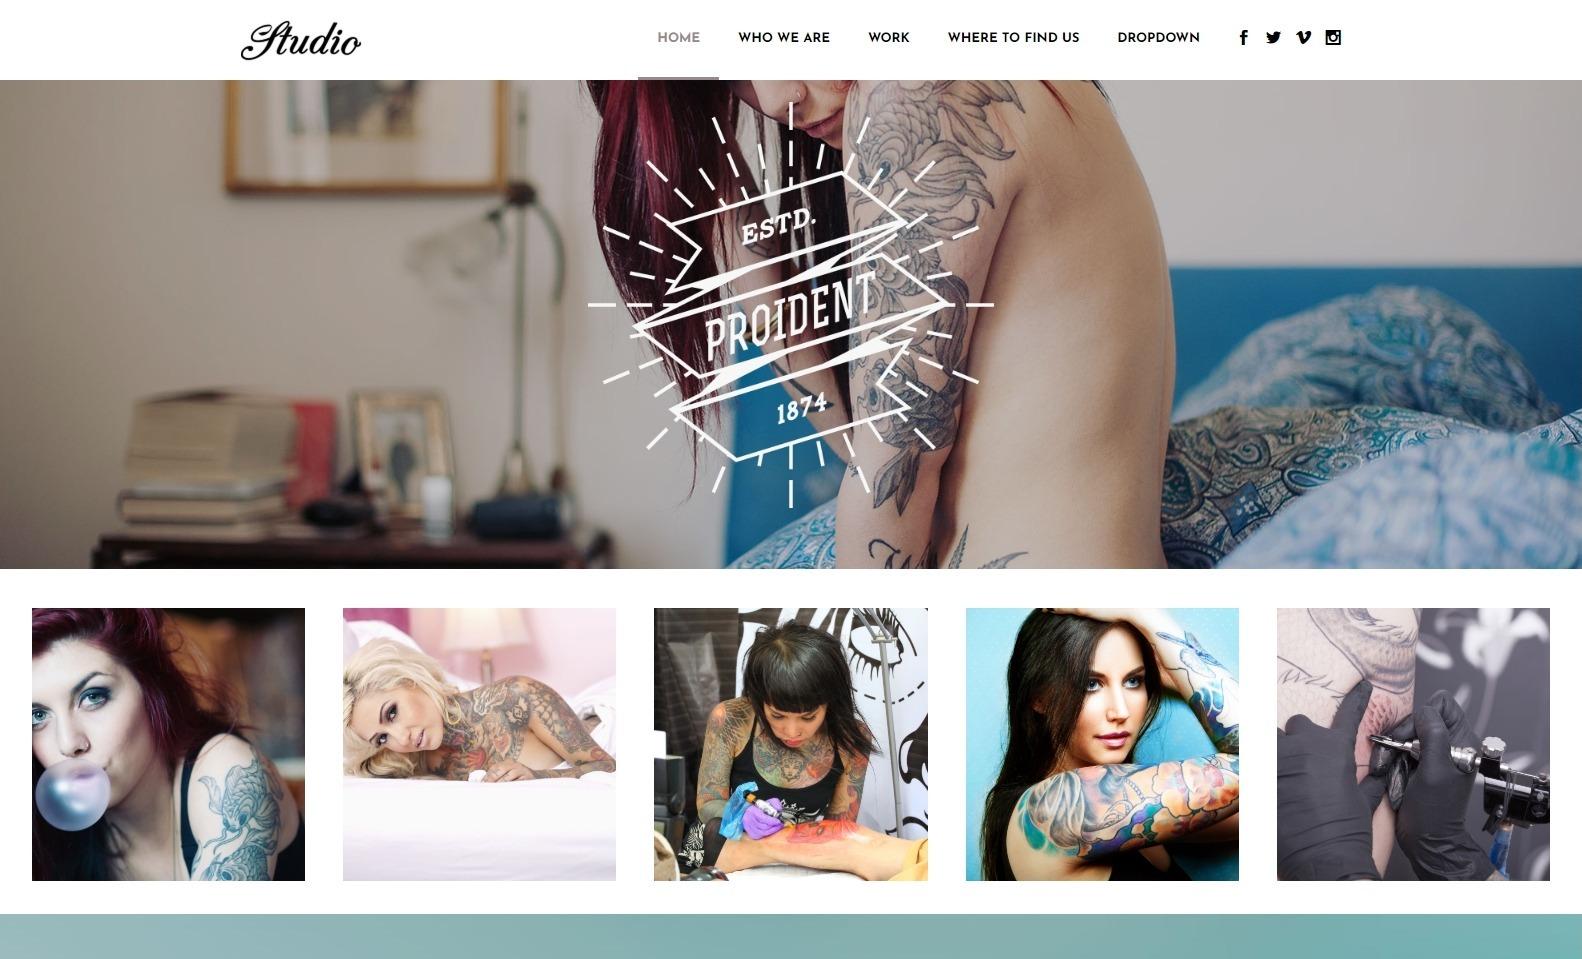 Bodega Multipurpose Theme with Tattoo Shop Design